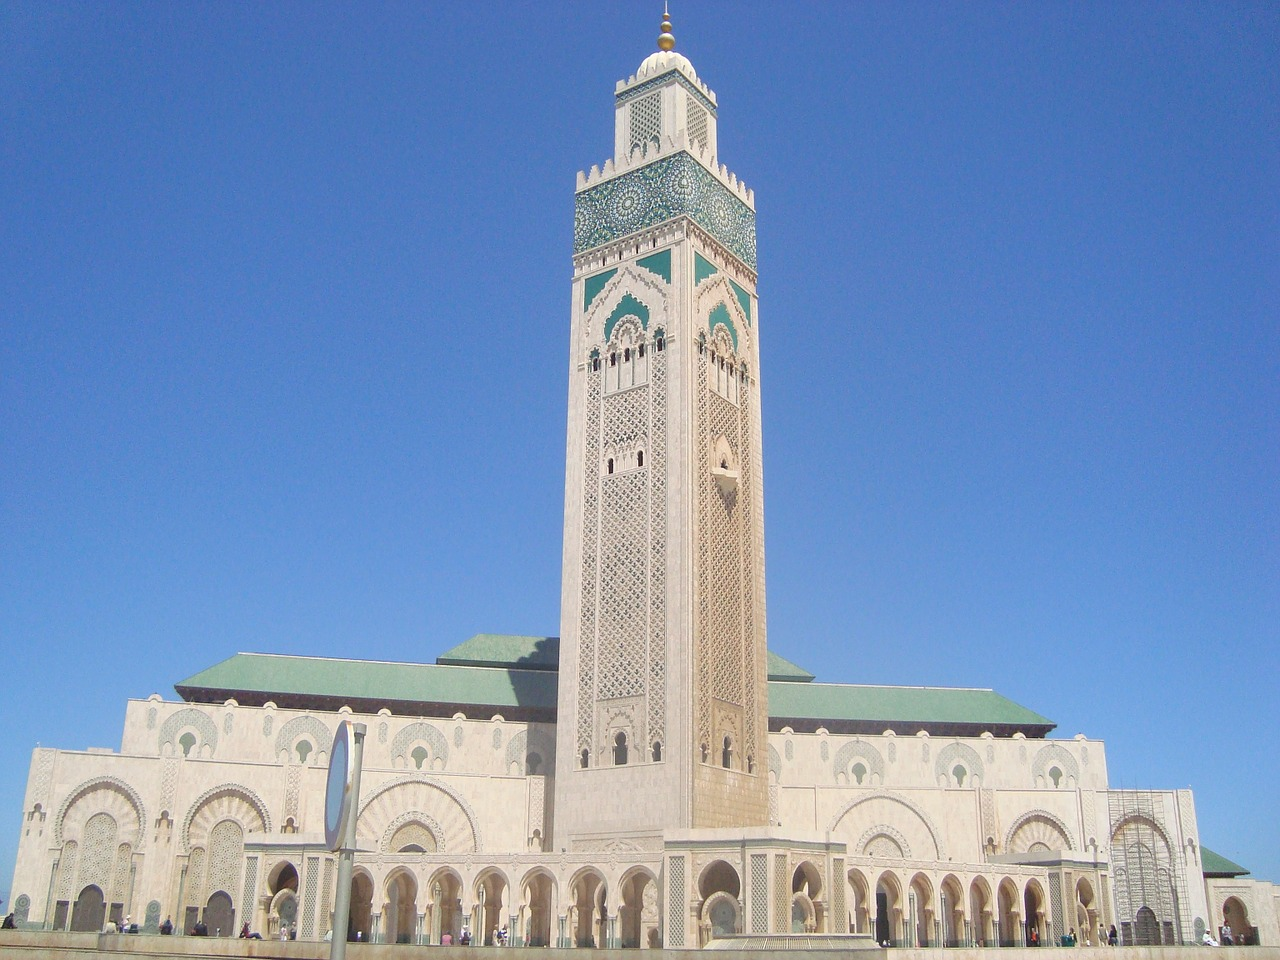 Moscheea Hassan II - Casablanca